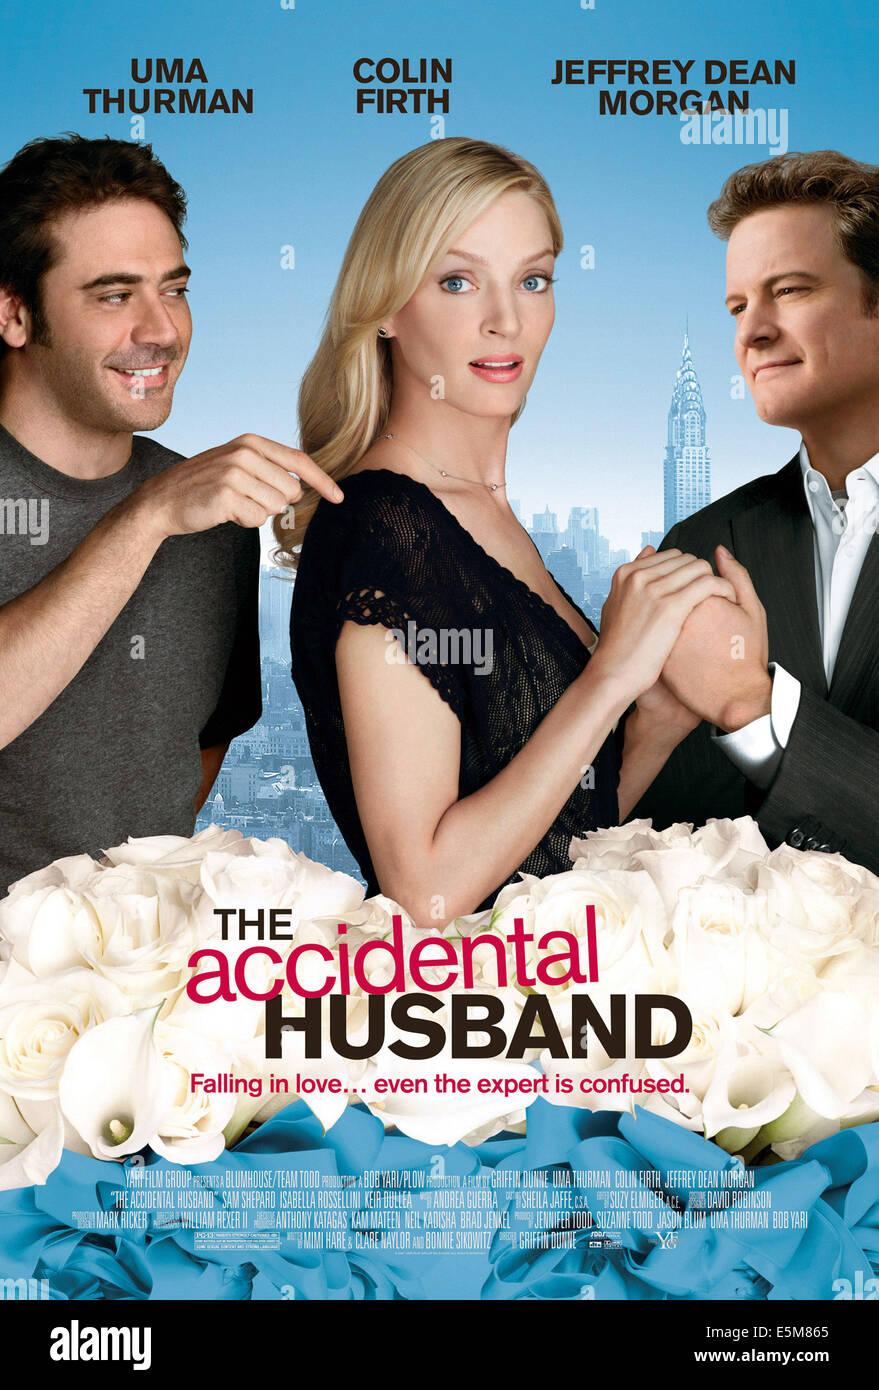 THE ACCIDENTAL HUSBAND, Jeffrey Dean Morgan, Uma Thurman, Colin Firth, 2008. ©Yari Film Group Releasing/courtesy - Stock Image